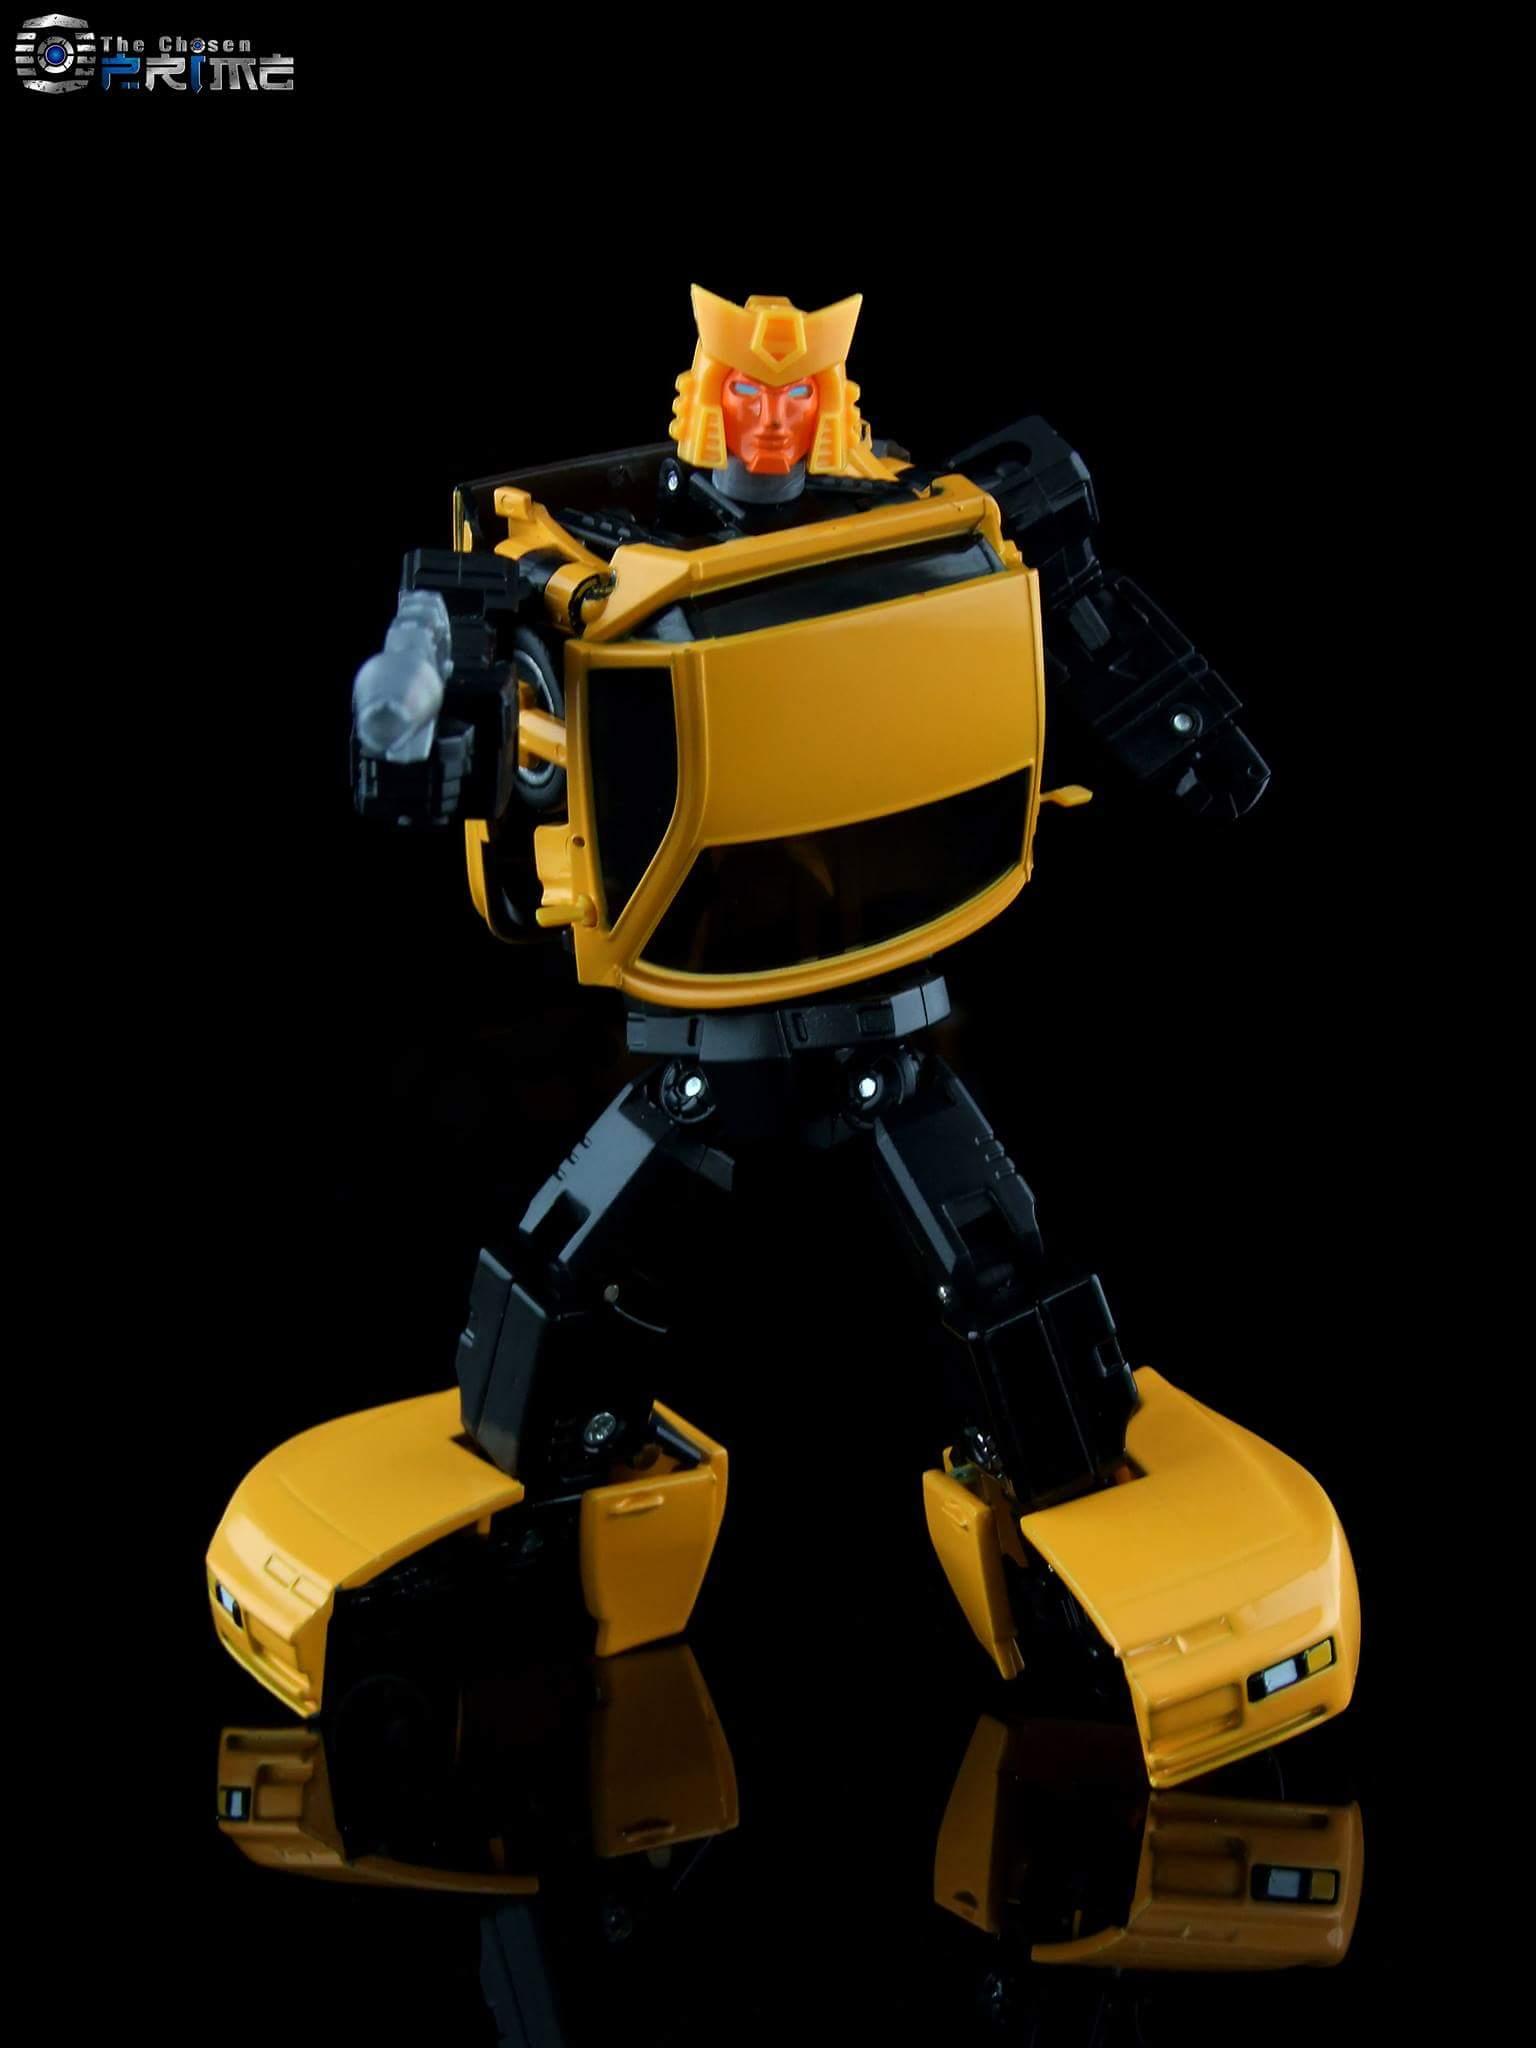 [ACE Collectables] Produit Tiers - Minibots MP - ACE-01 Tumbler (aka Cliffjumper/Matamore), ACE-02 Hiccups (aka Hubcap/Virevolto), ACE-03 Trident (aka Seaspray/Embruns) MYzAVMxw